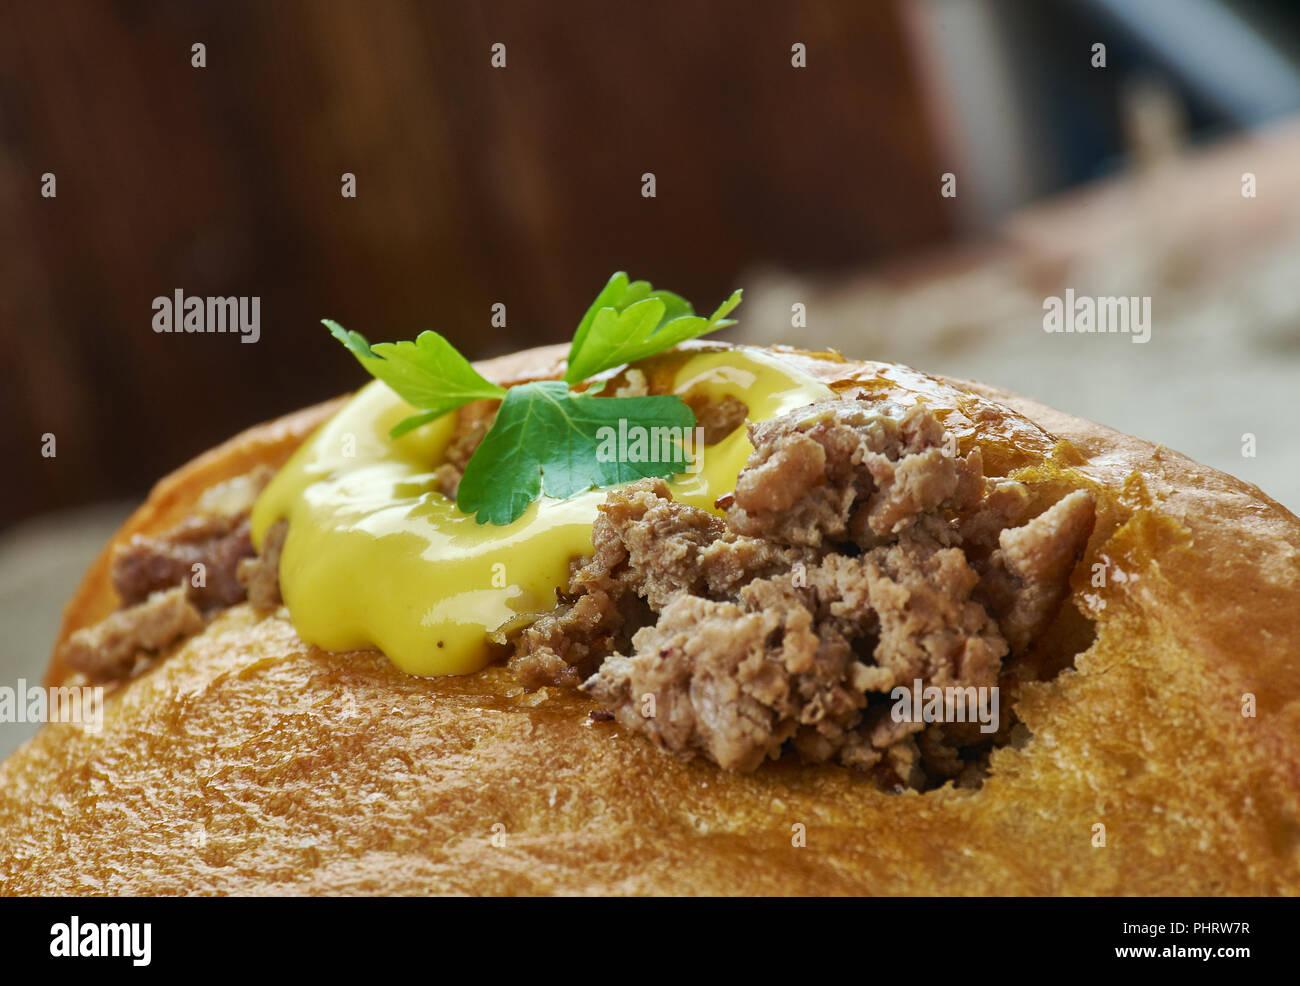 Petits pains farcis - Stock Image